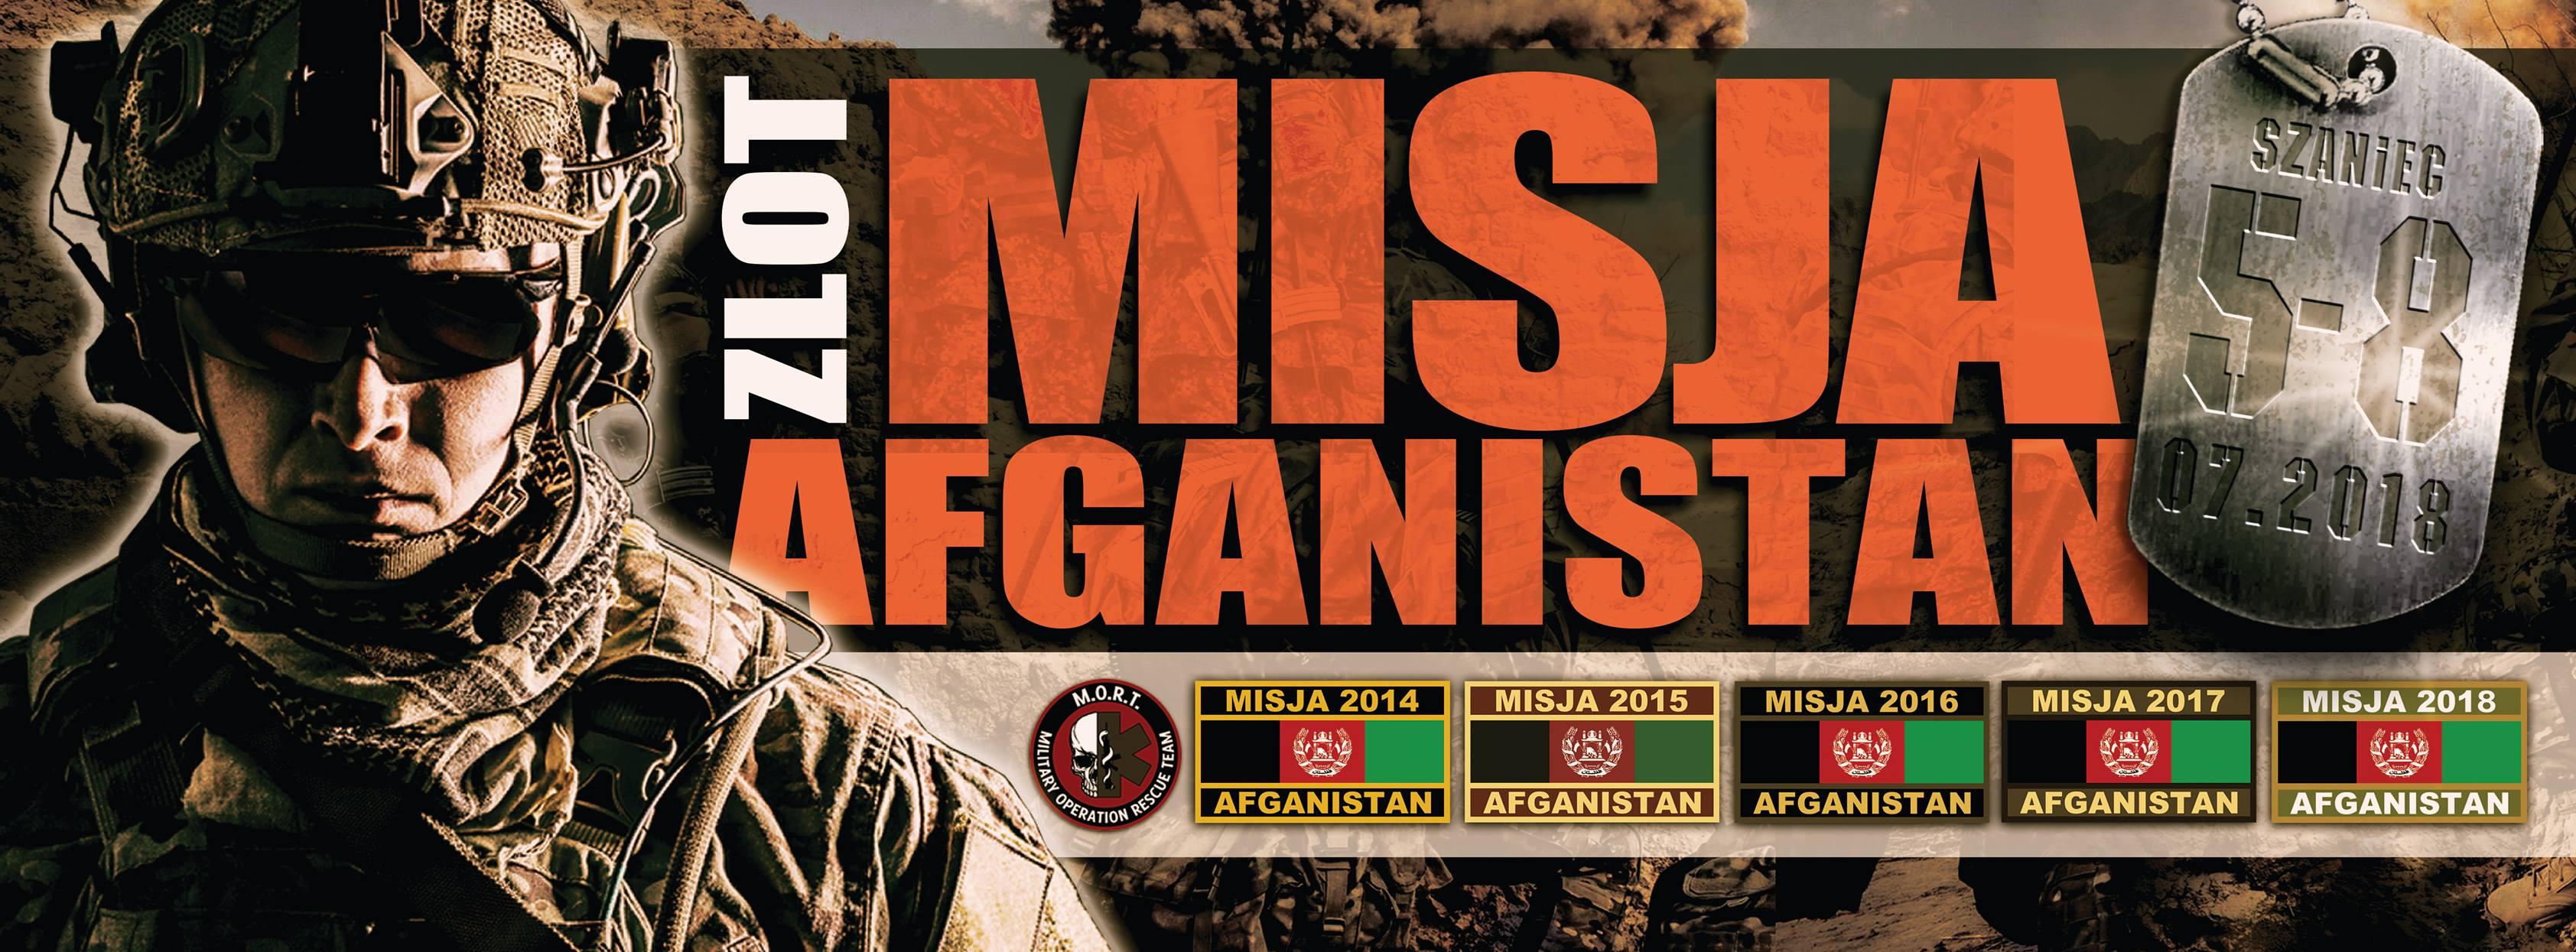 Misja afganistan online